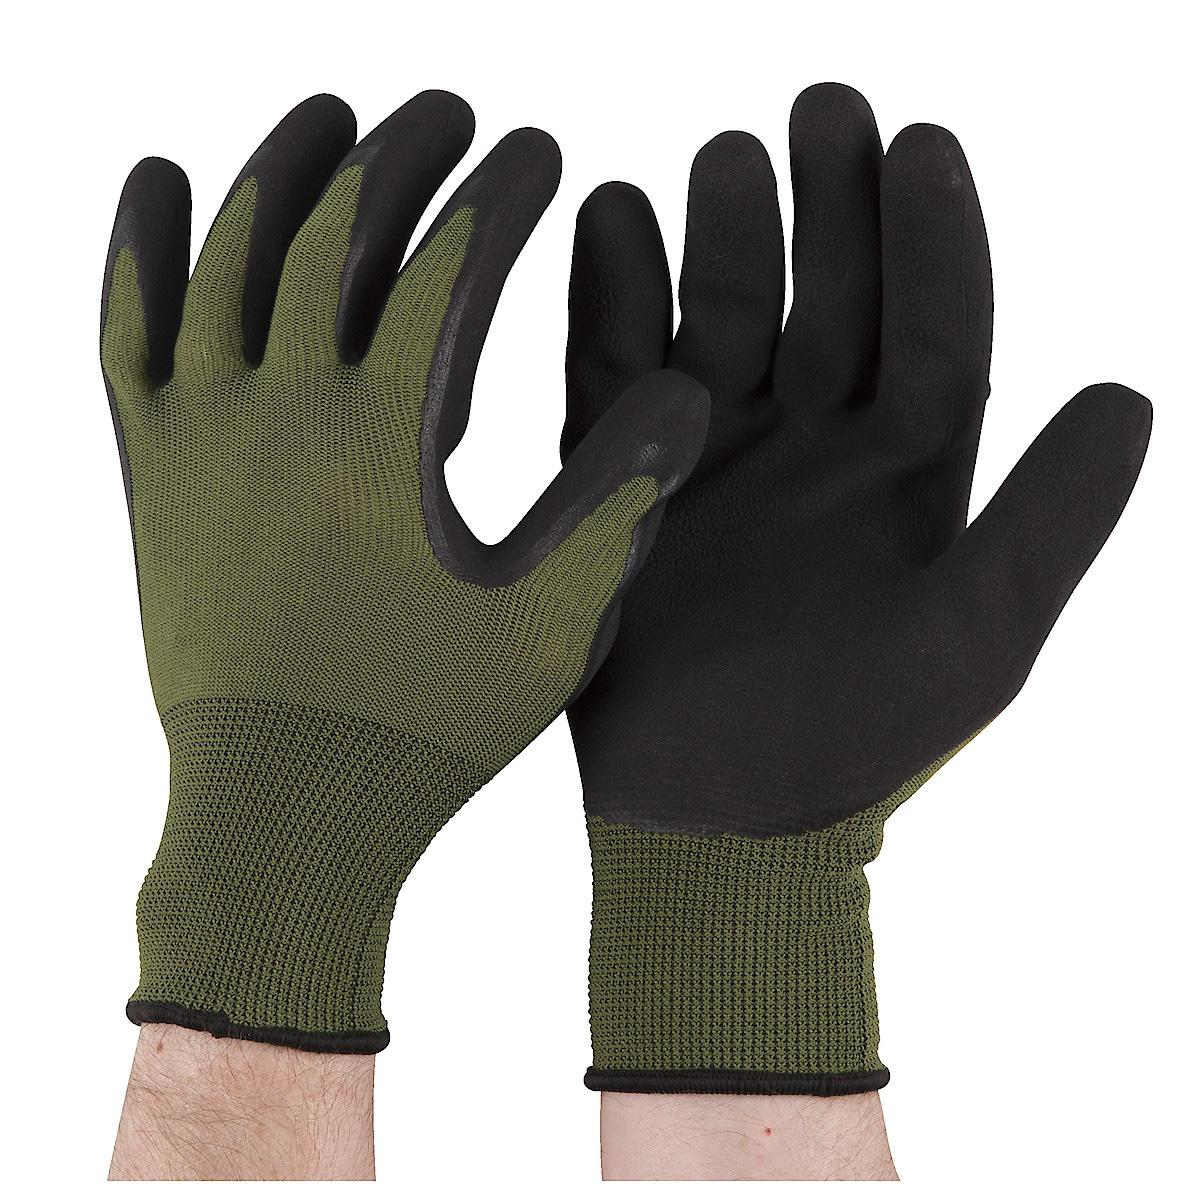 Latexhandskar grön